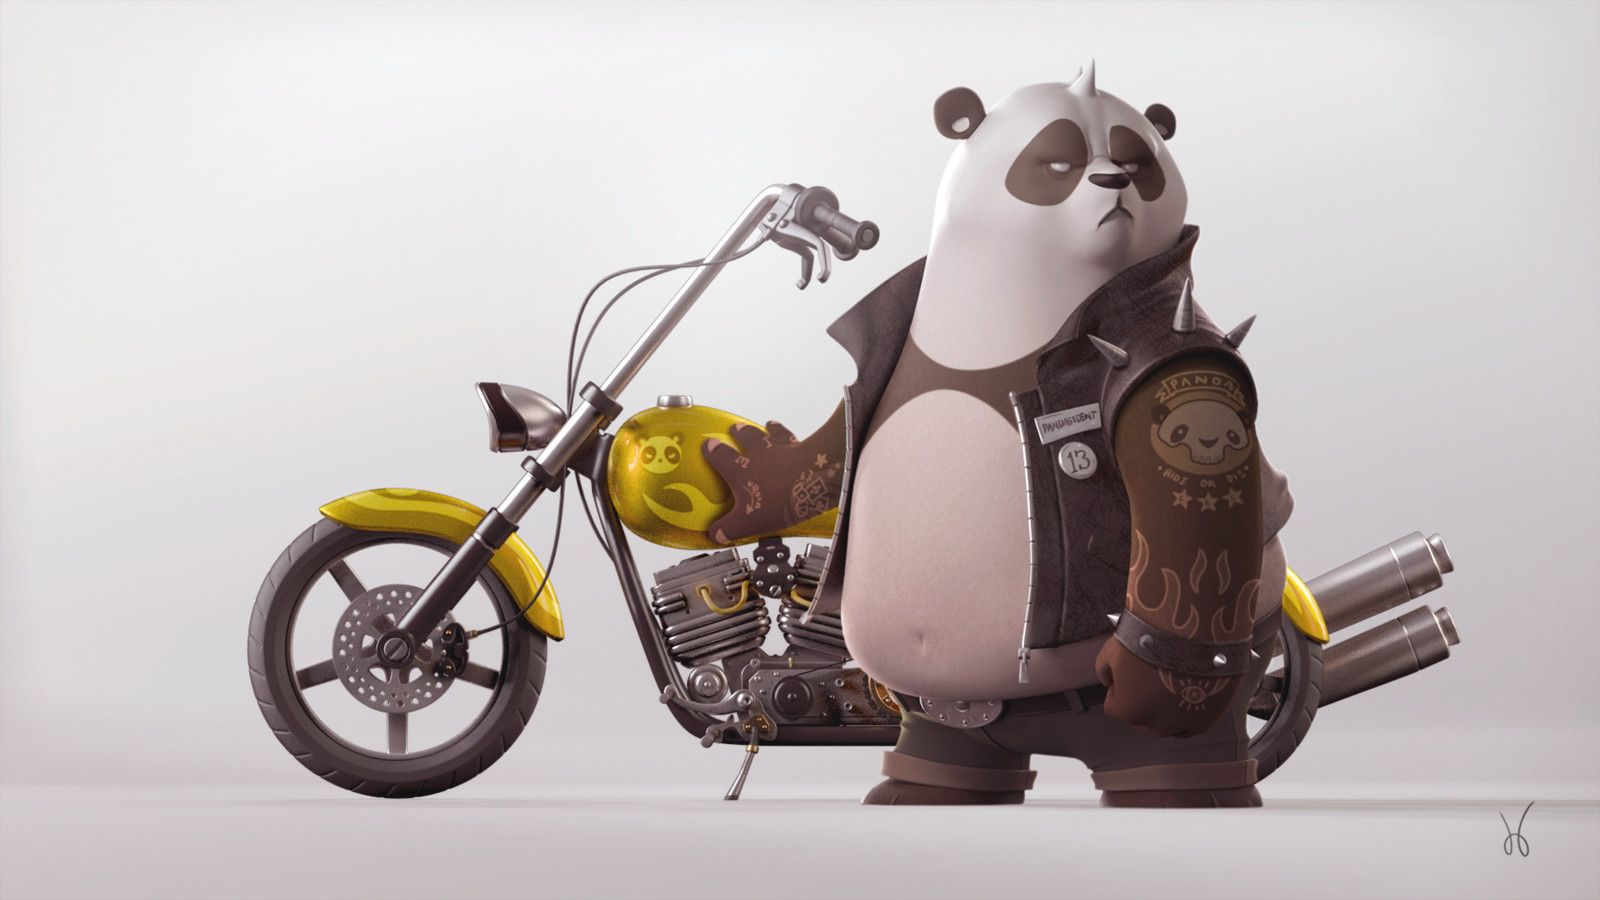 Biker Panda Jose Baldo On Artstation At Https Www Artstation